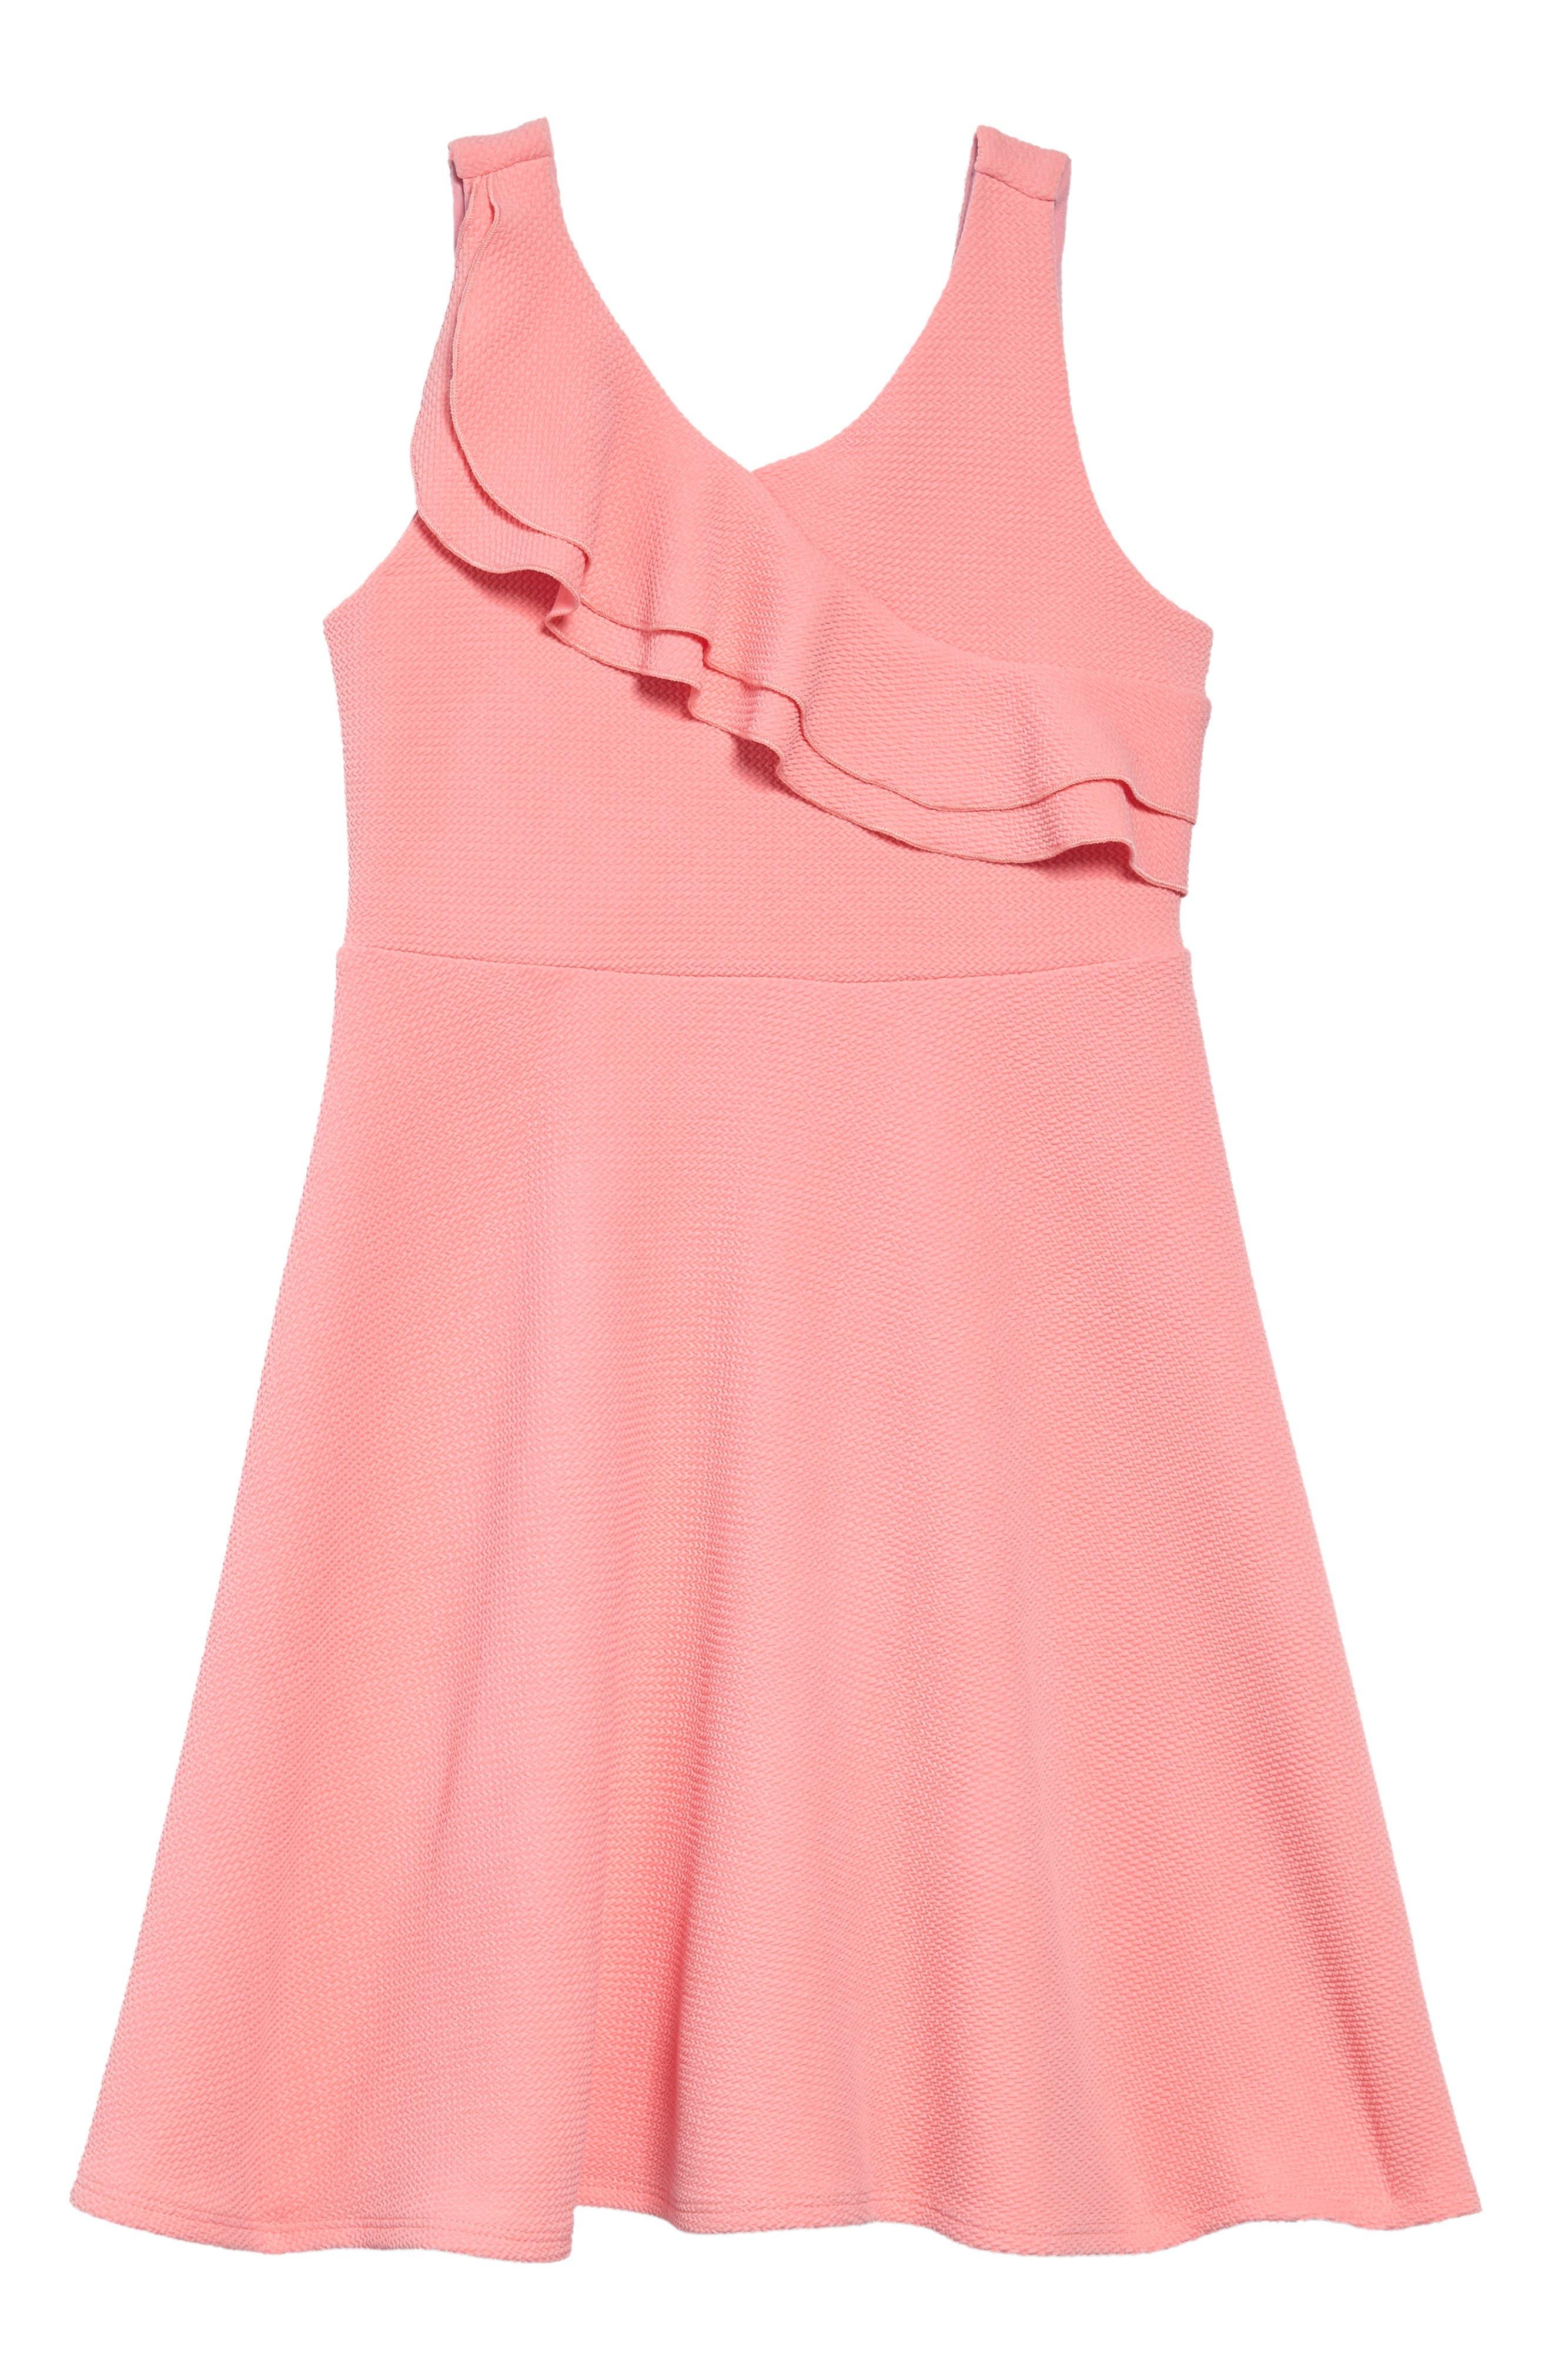 Double Ruffle Dress,                         Main,                         color, Peach